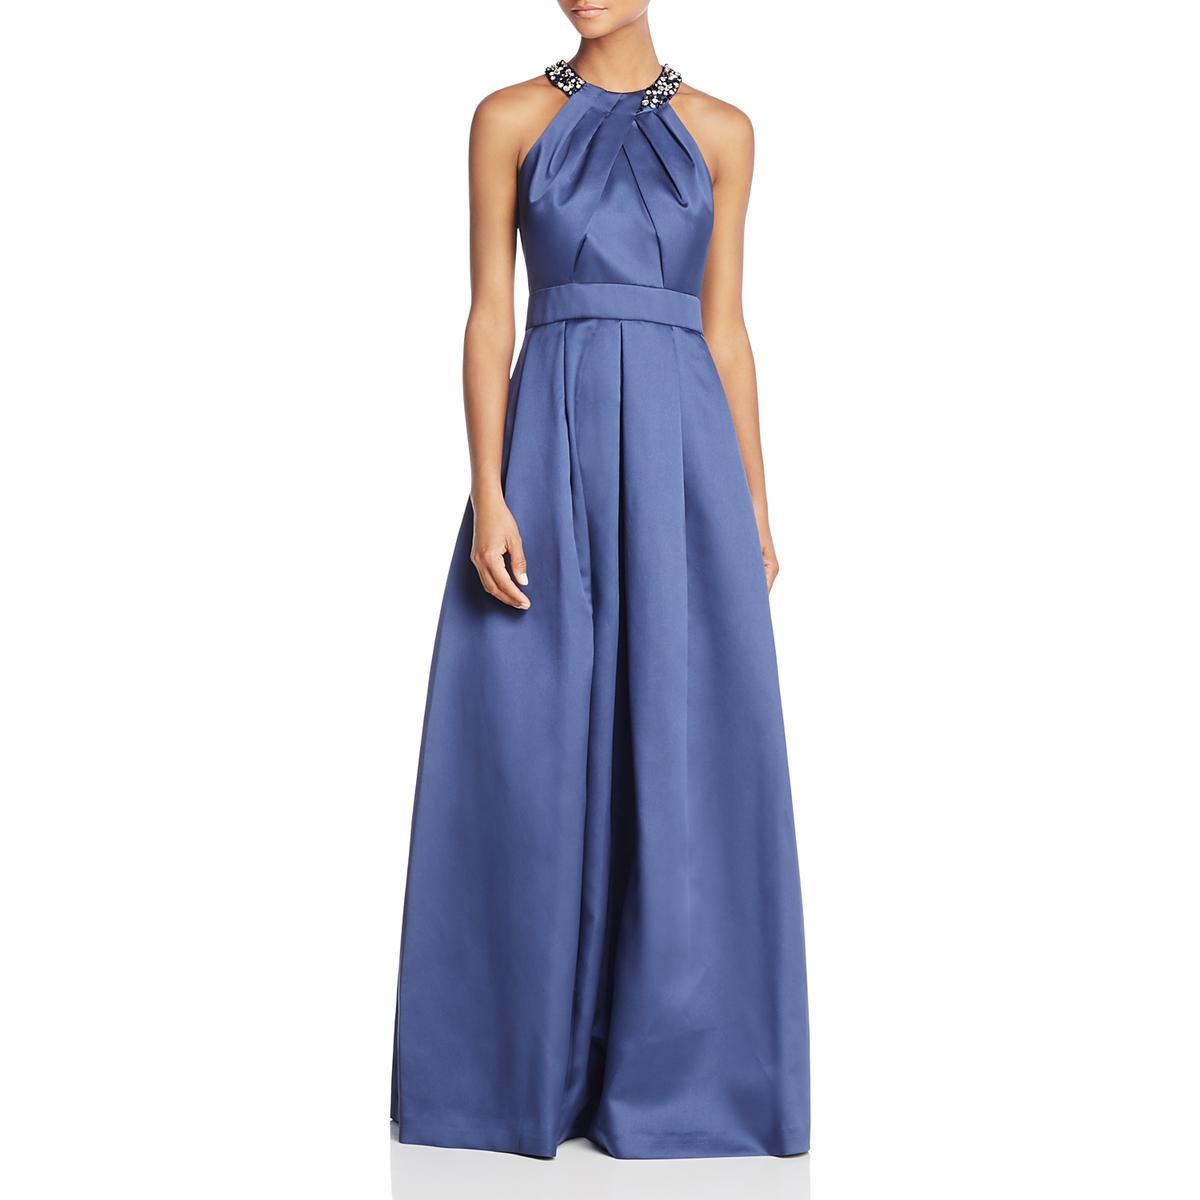 Eliza J Womens Sleeveless Full-Length Evening Dress Gown BHFO 4390 ...